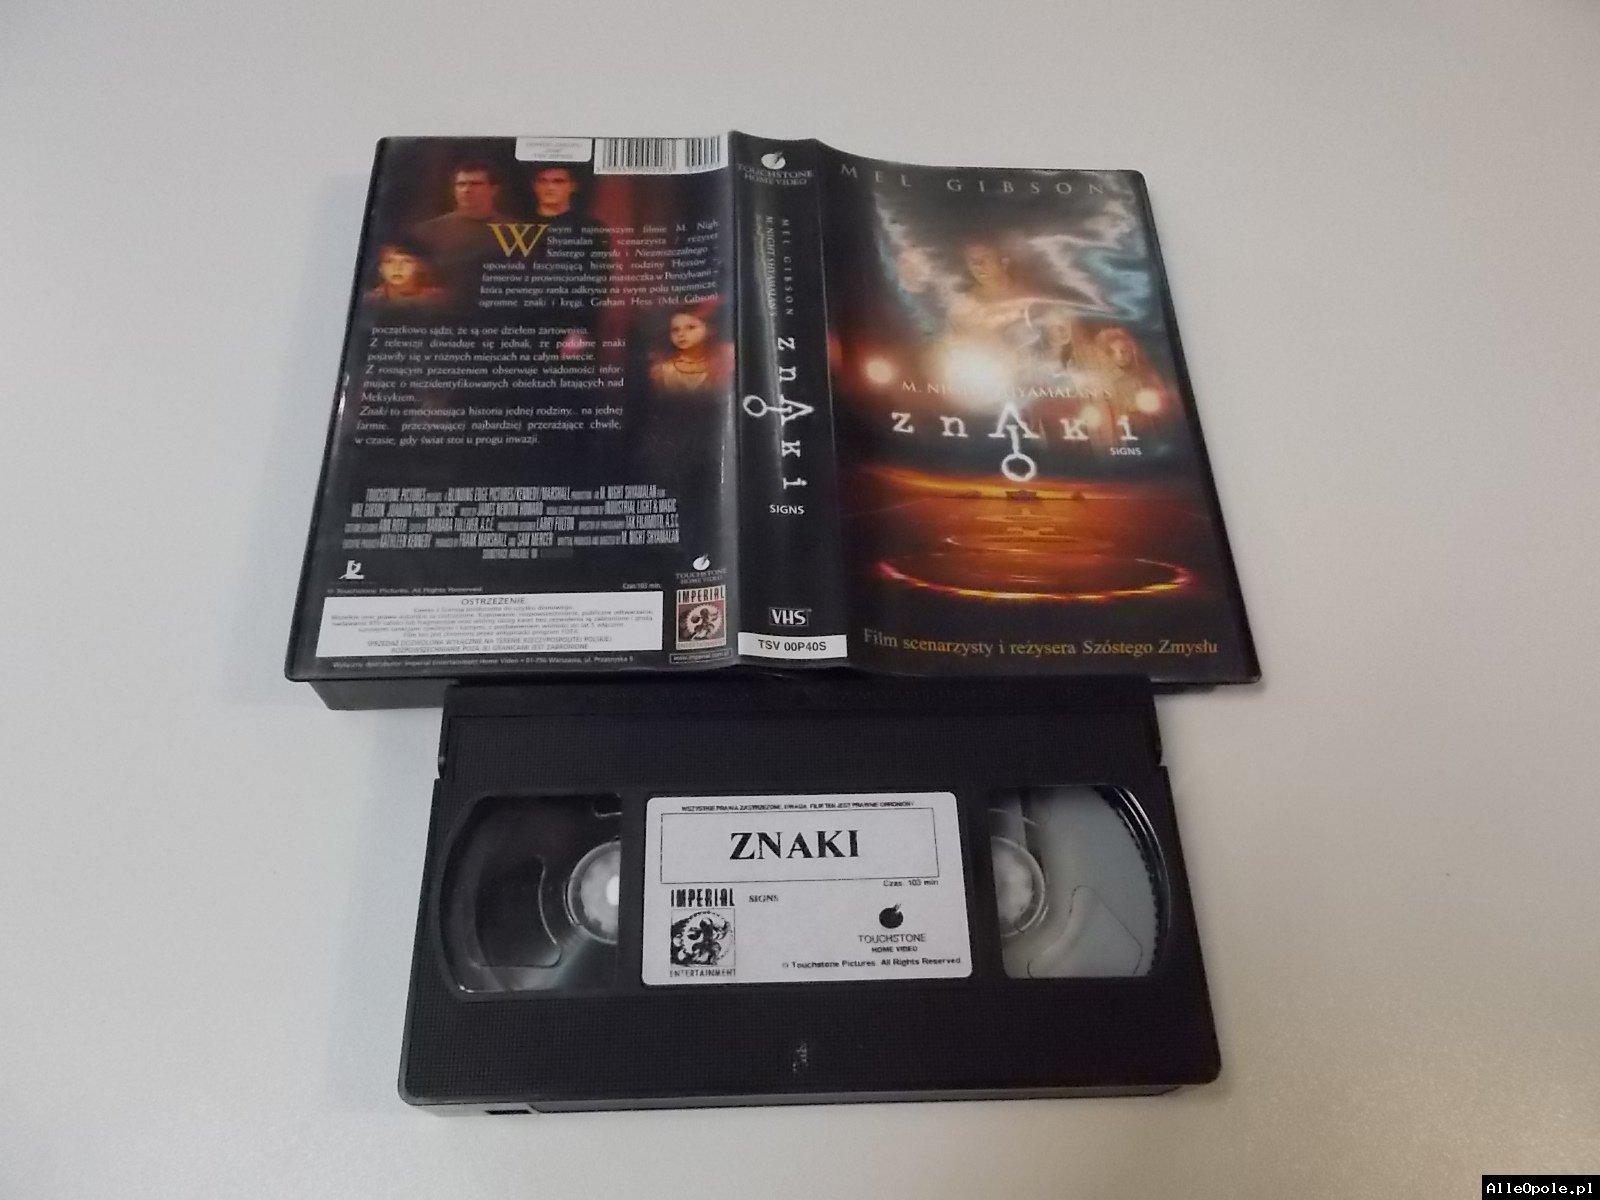 ZNAKI - VHS Kaseta Video - Opole 1718